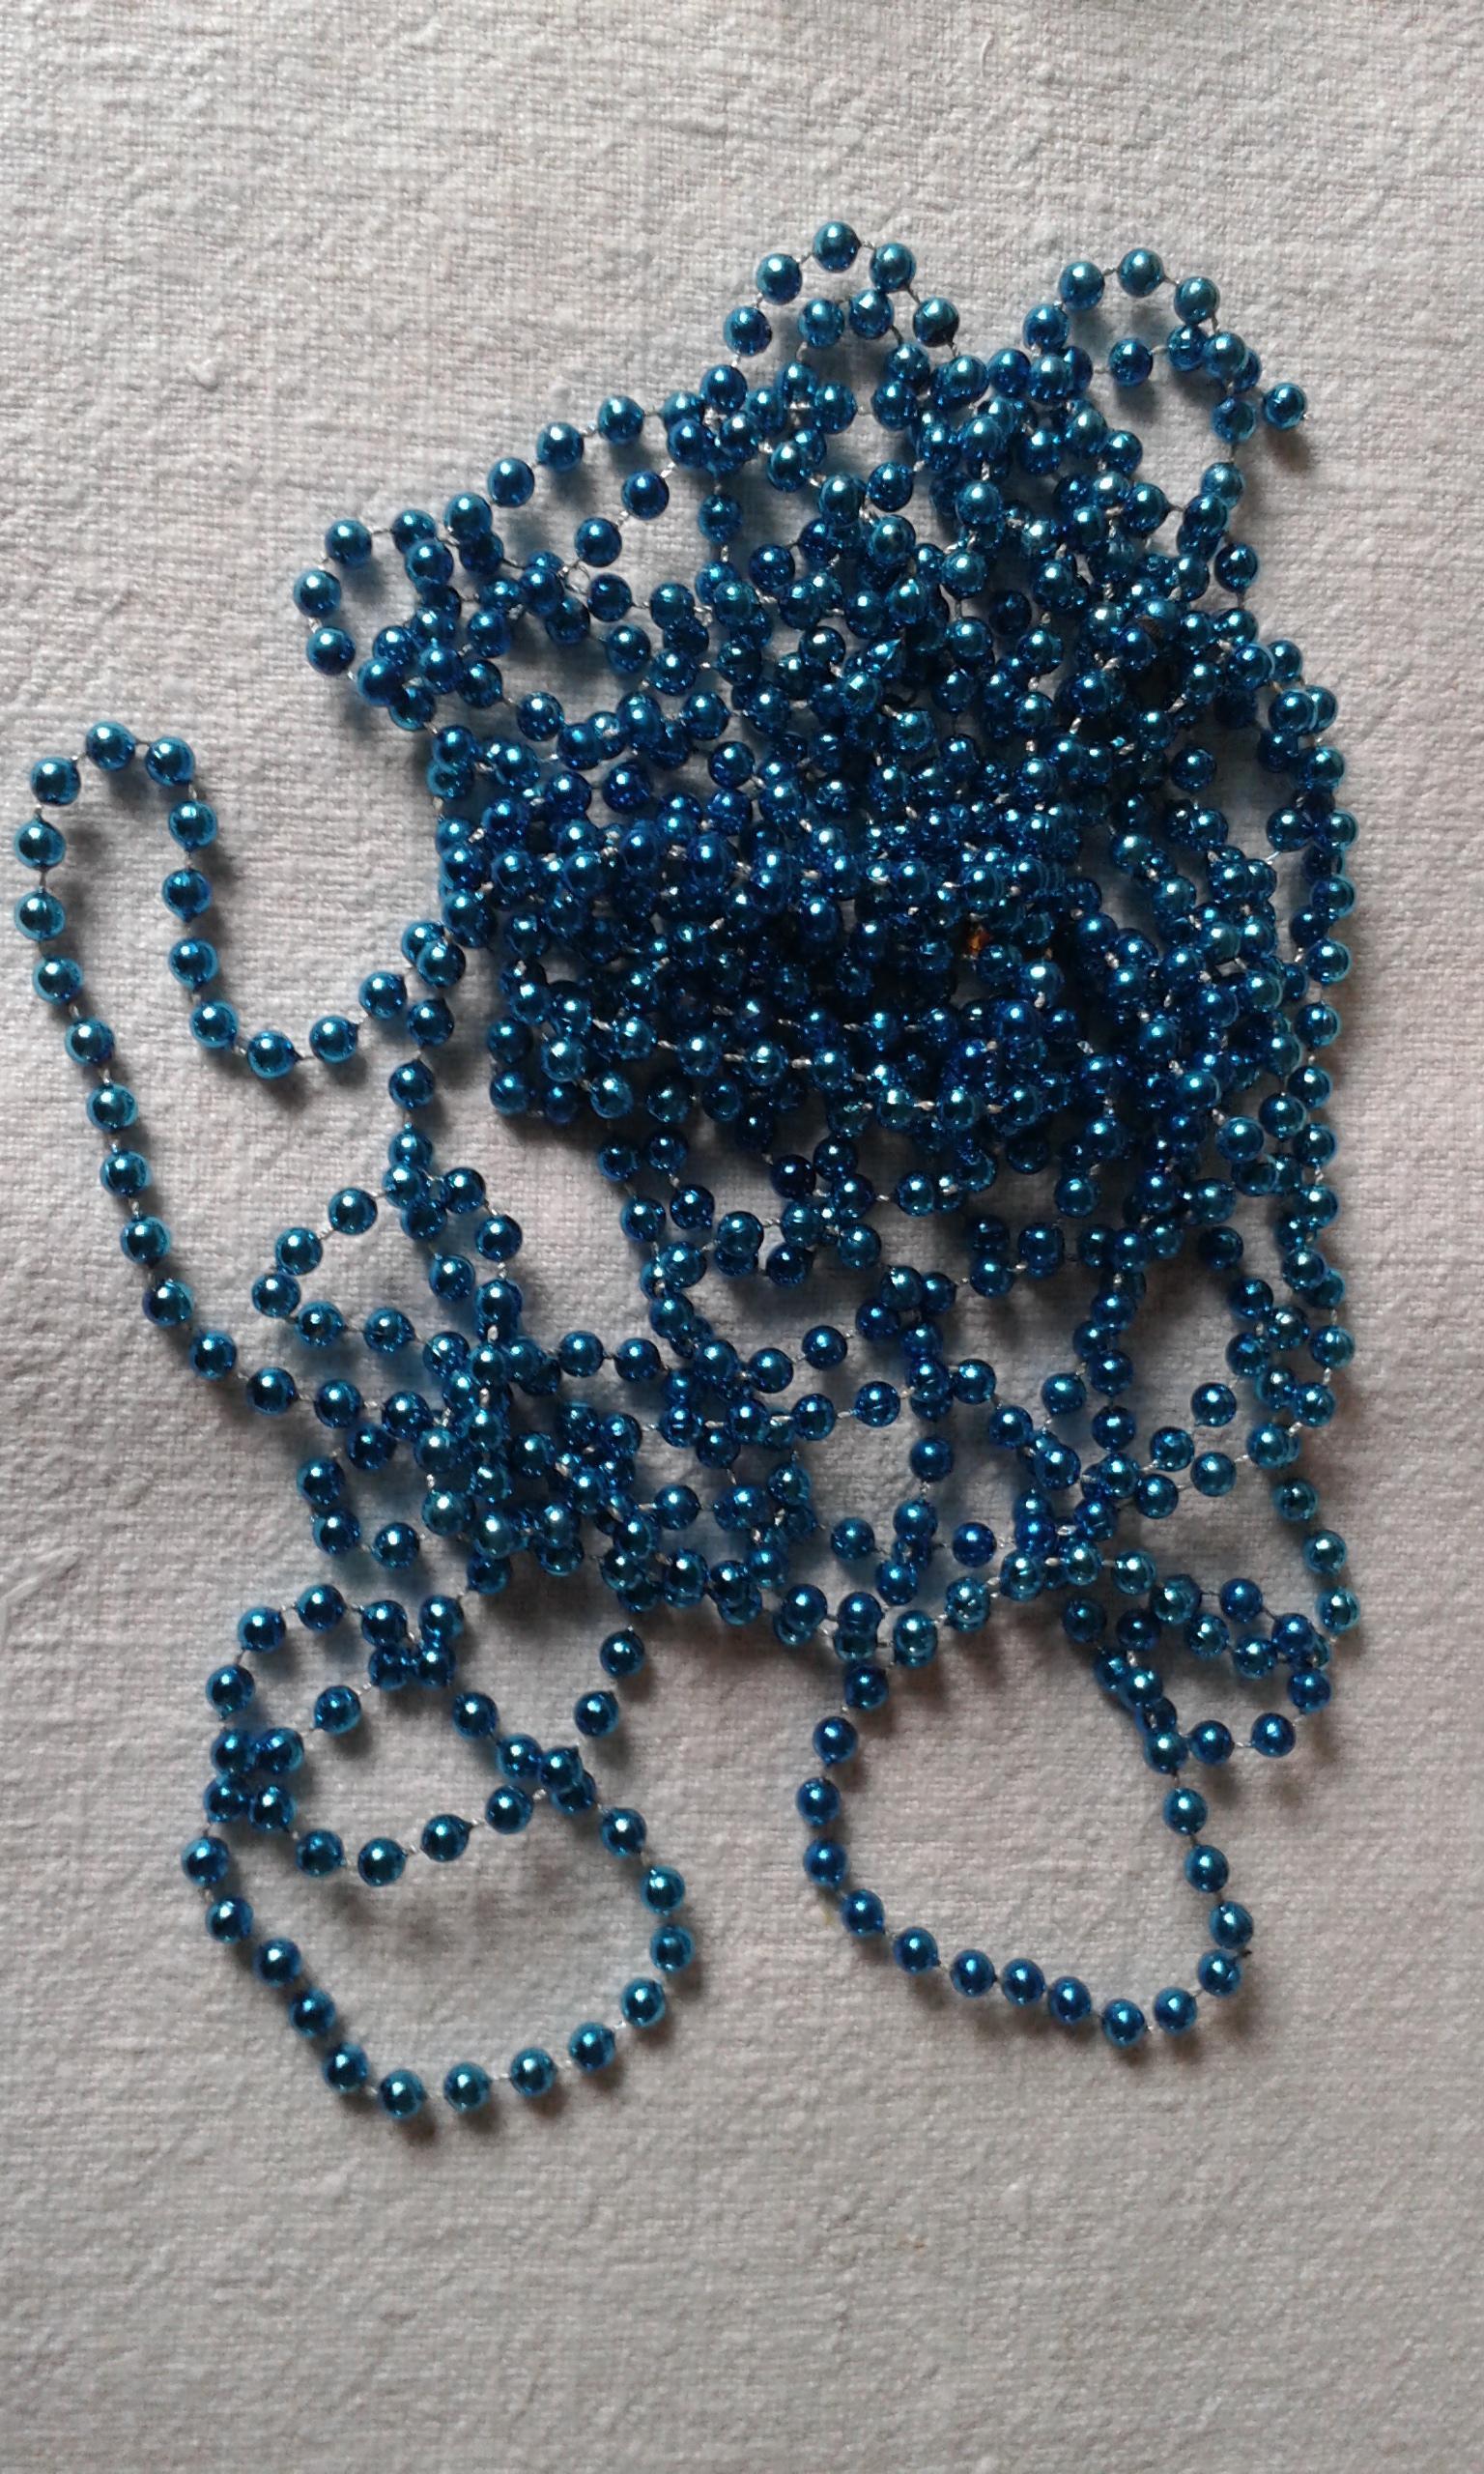 troc de troc reserve *****grande guirlande de perles turquoise image 0